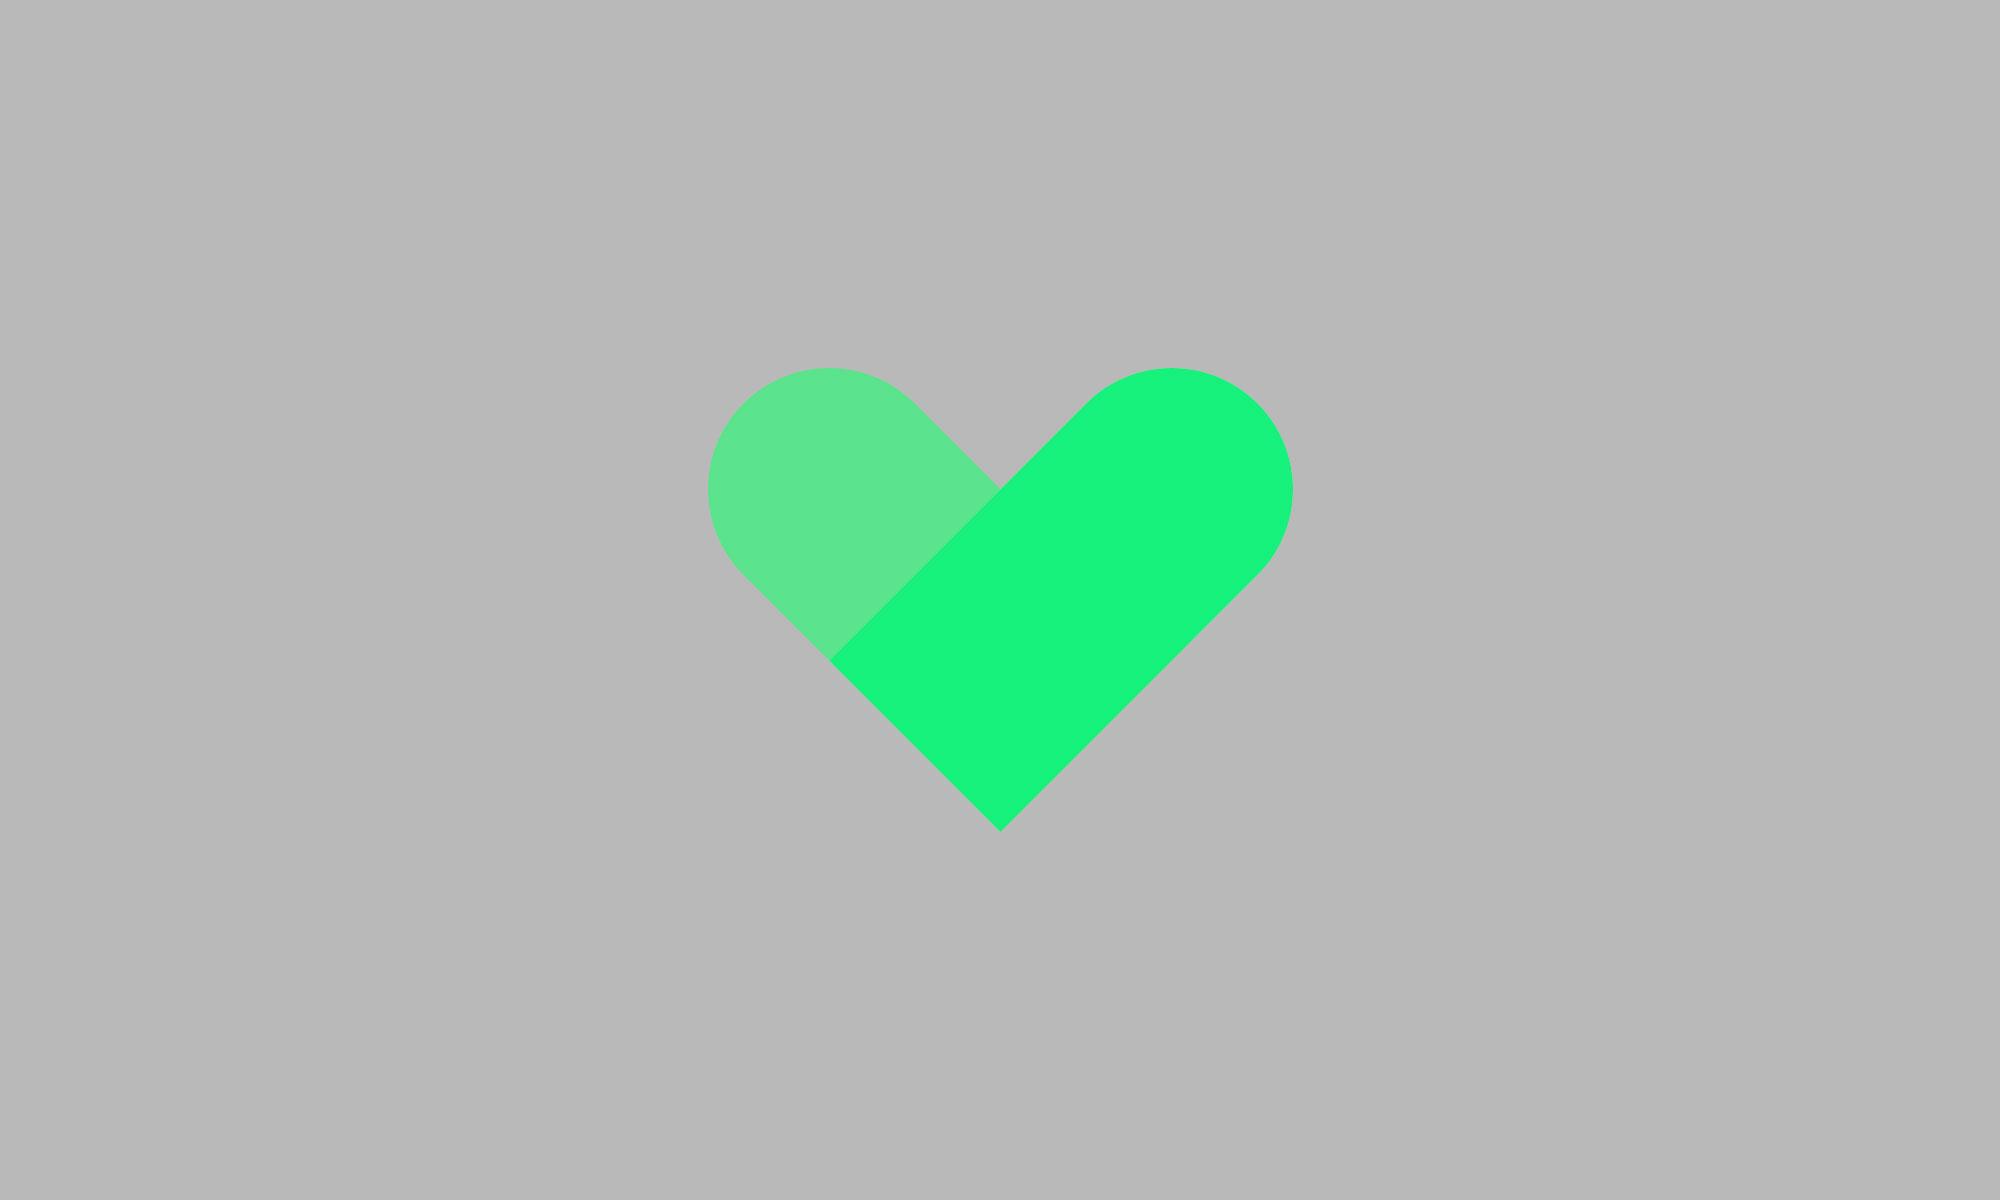 humankind heart